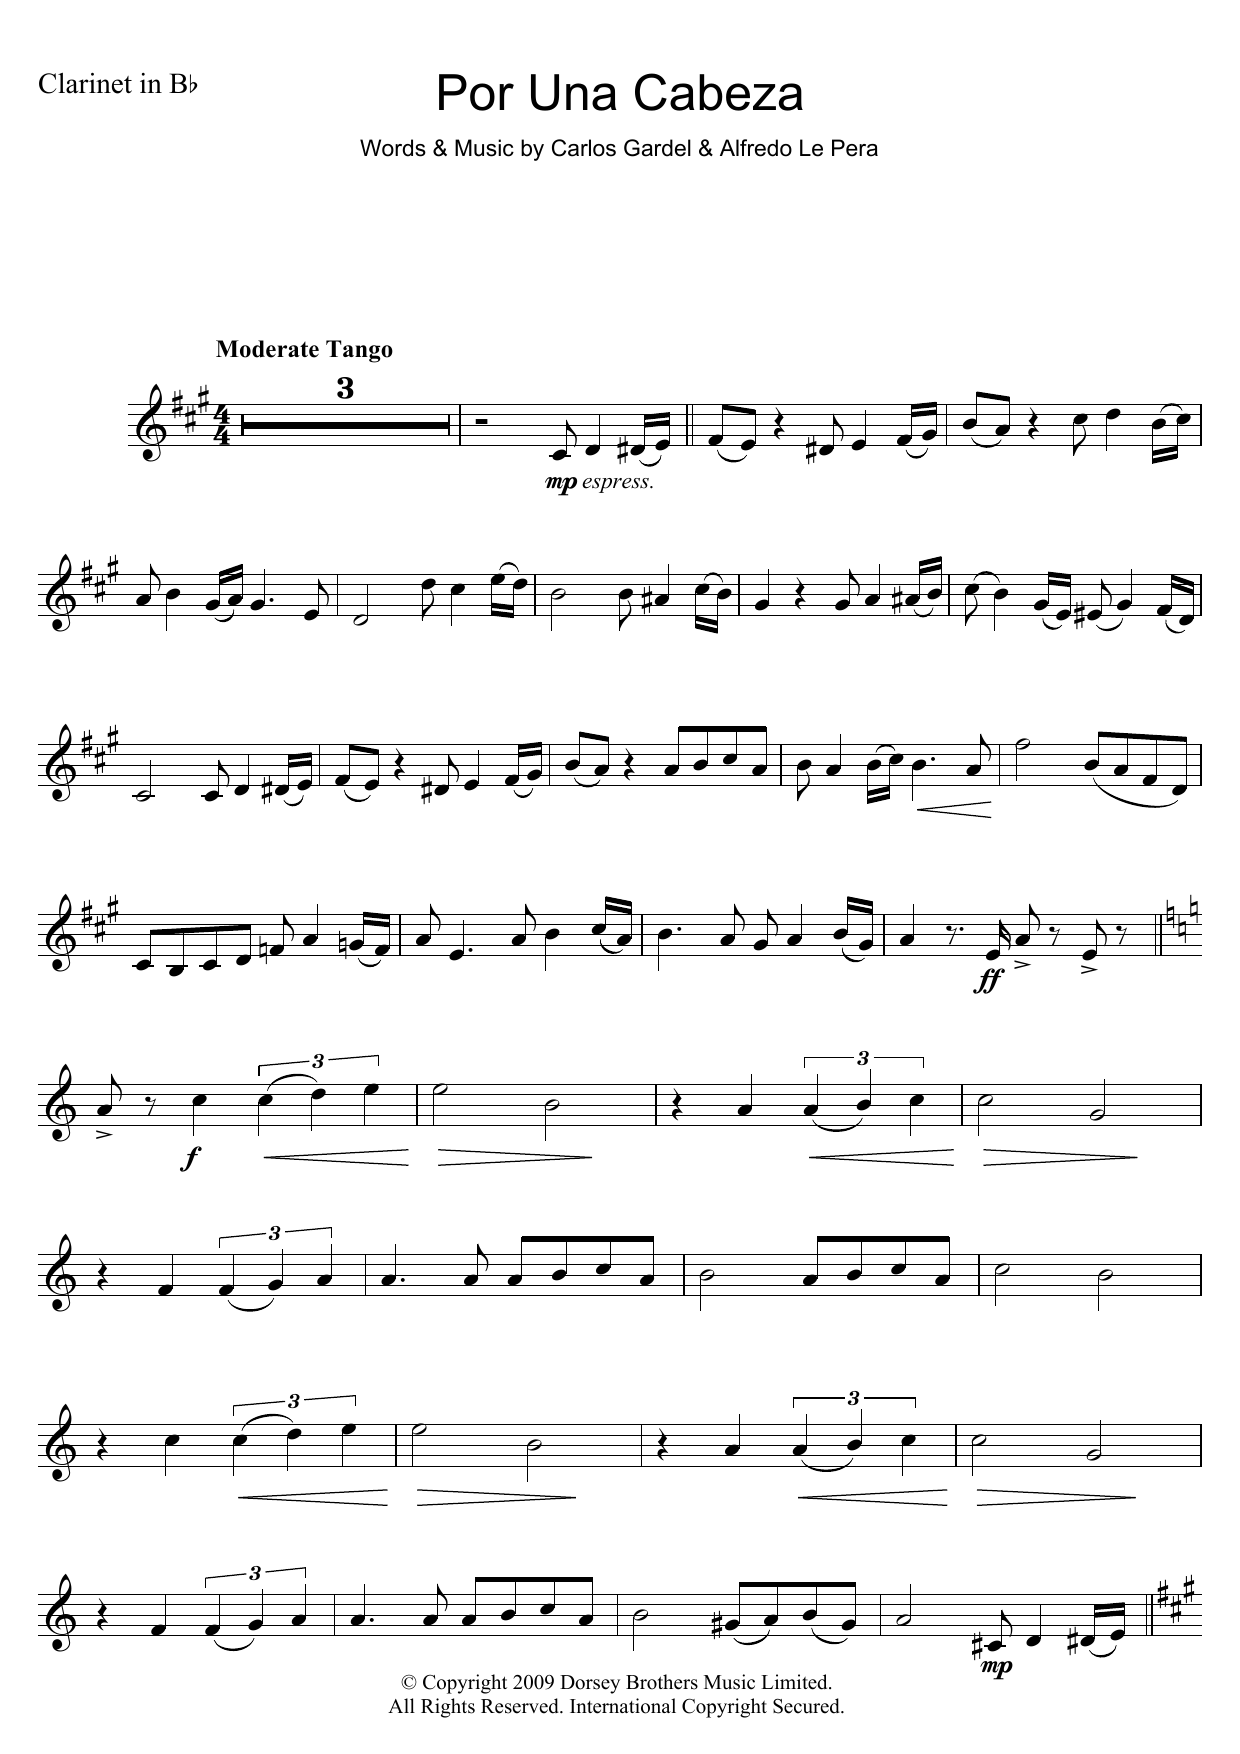 Por Una Cabeza sheet music